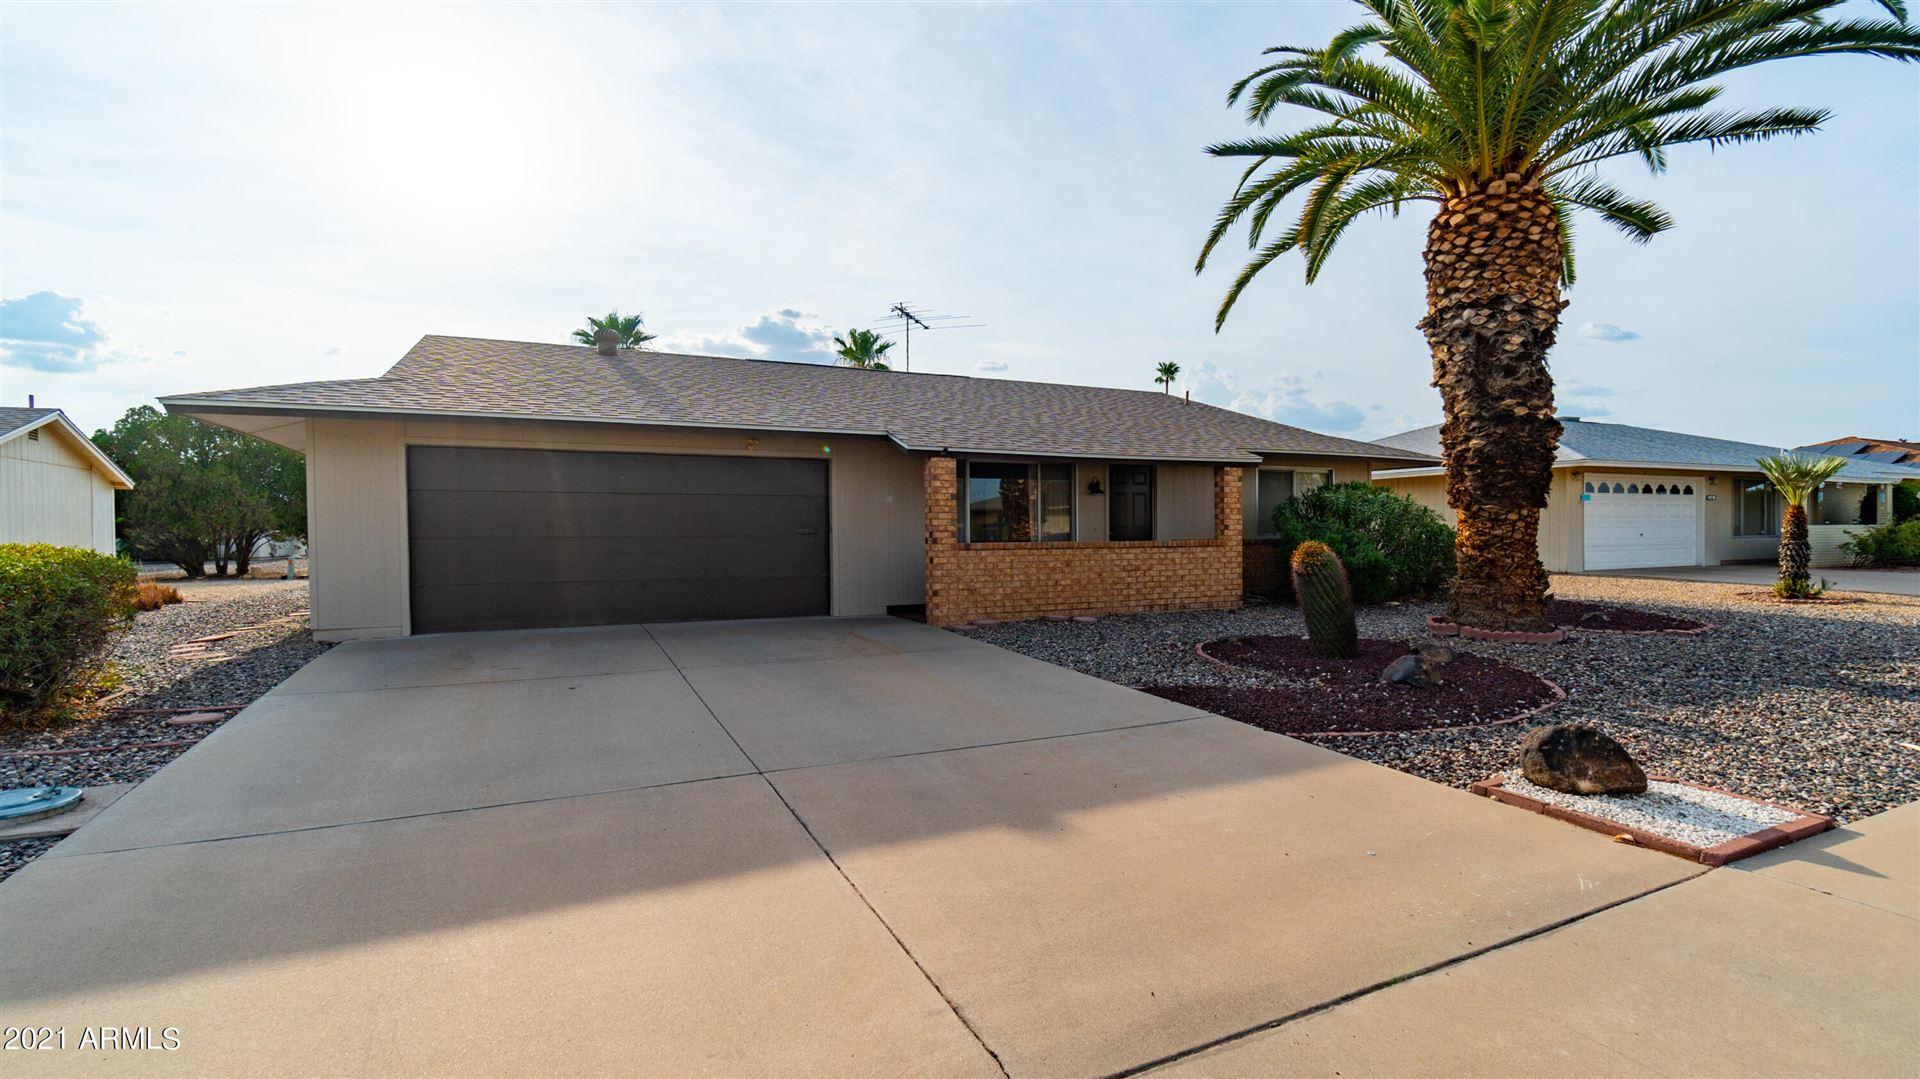 Photo of 17420 N HORSESHOE Lane, Sun City, AZ 85373 (MLS # 6267926)